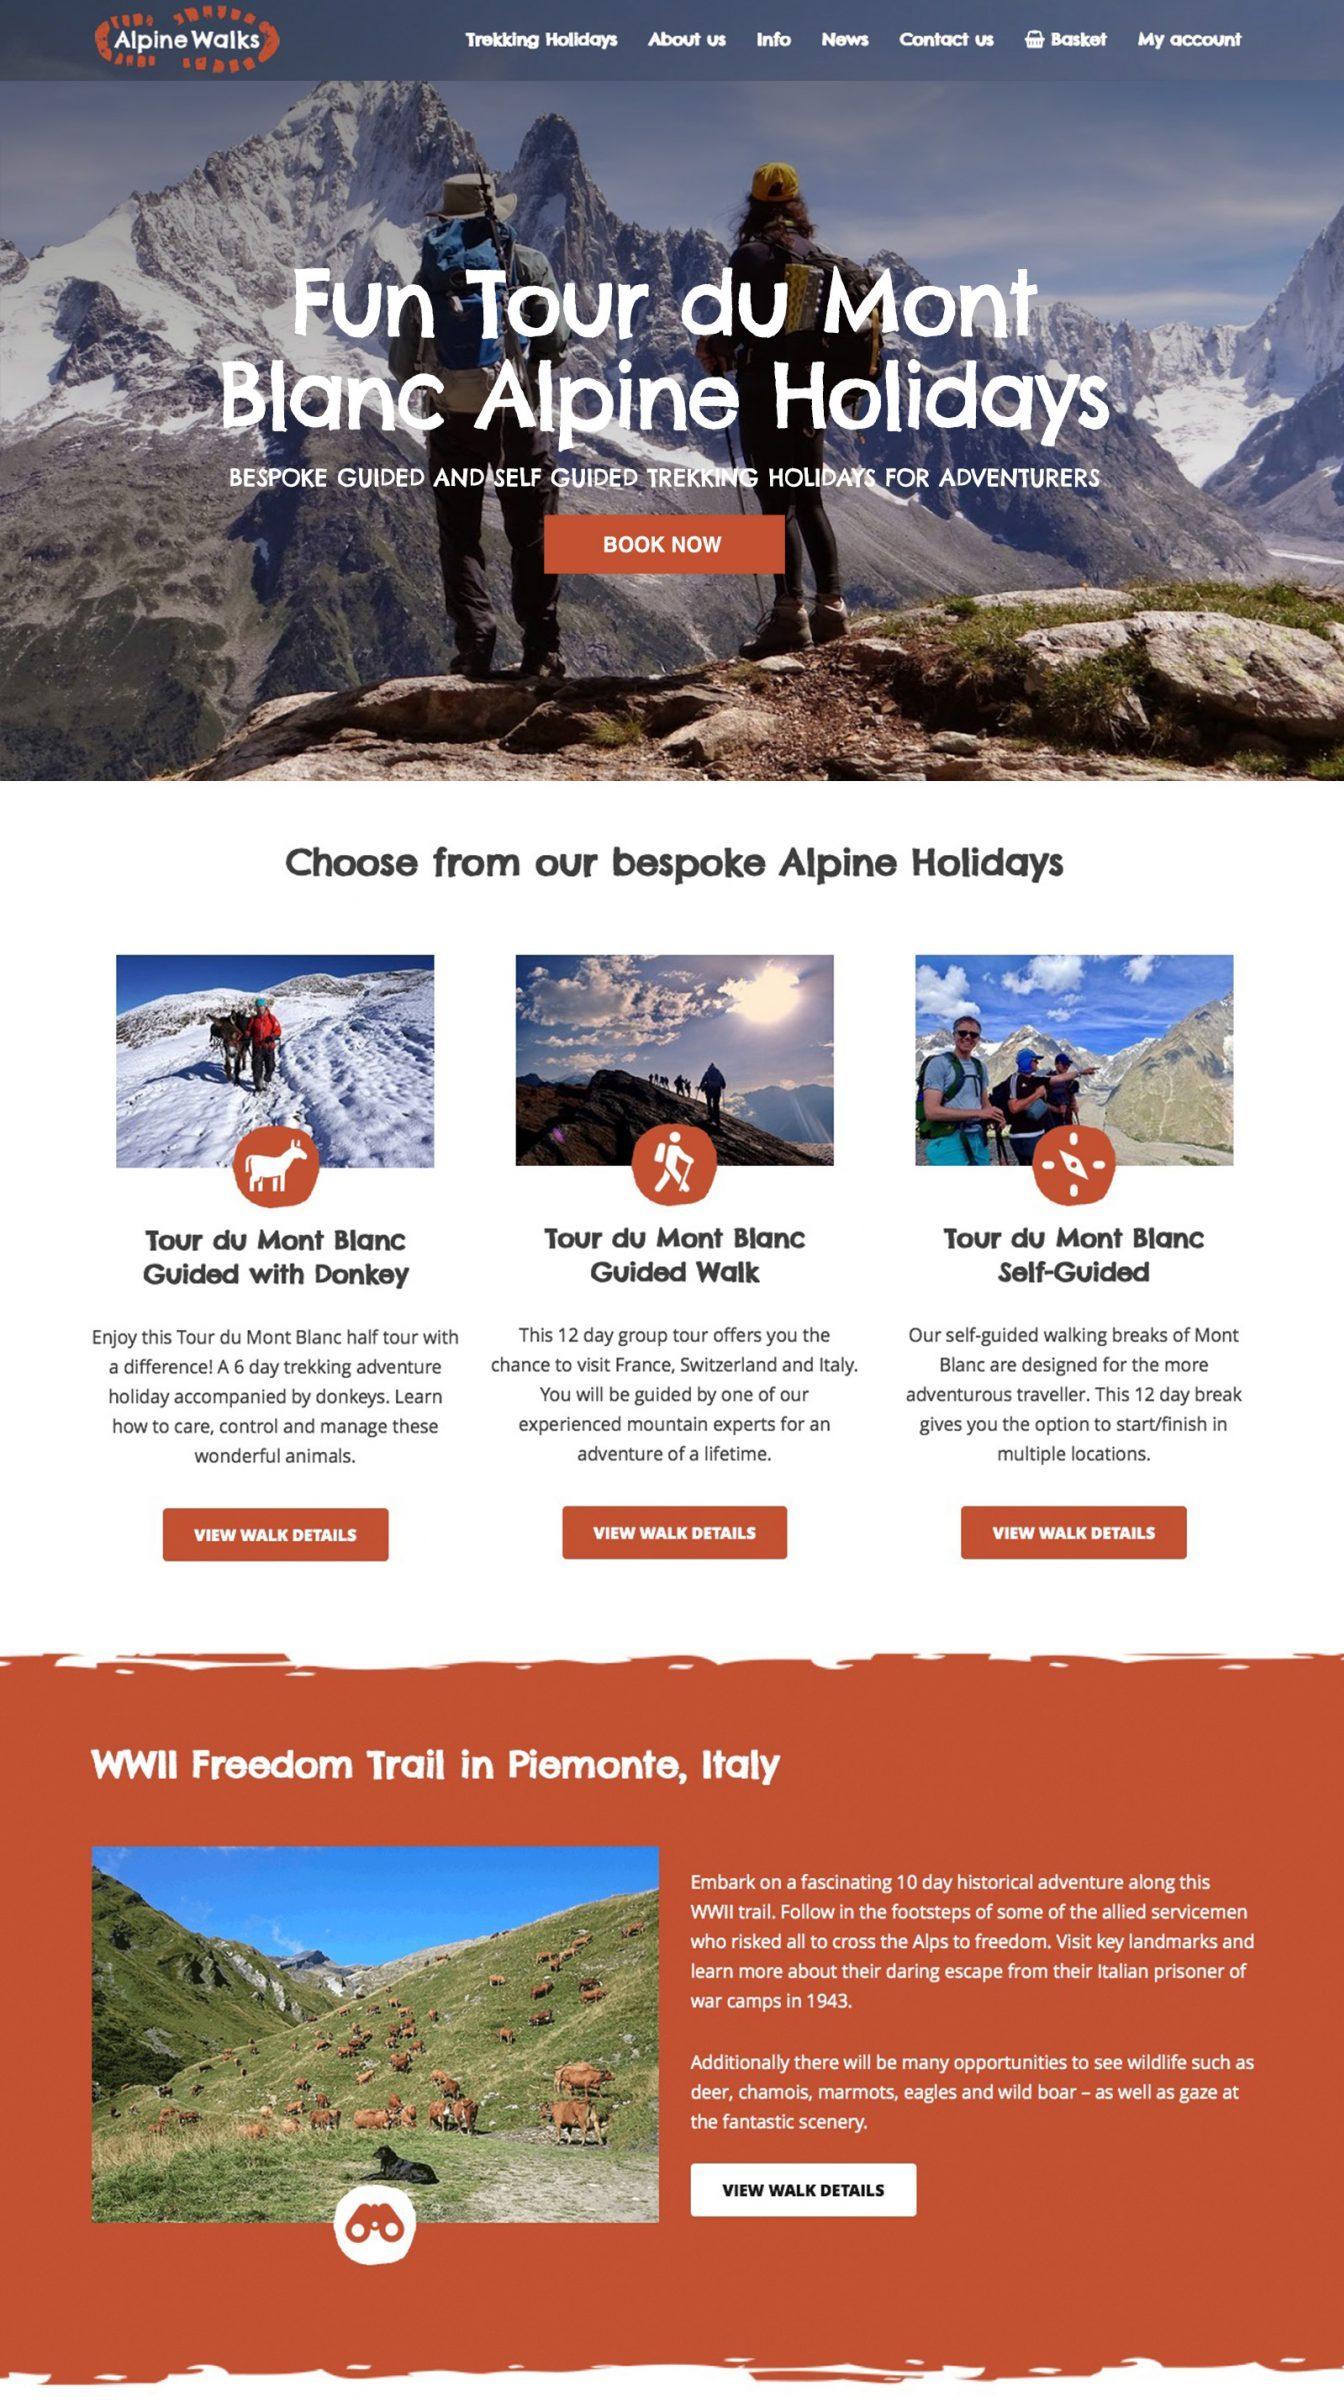 alpine walks site top